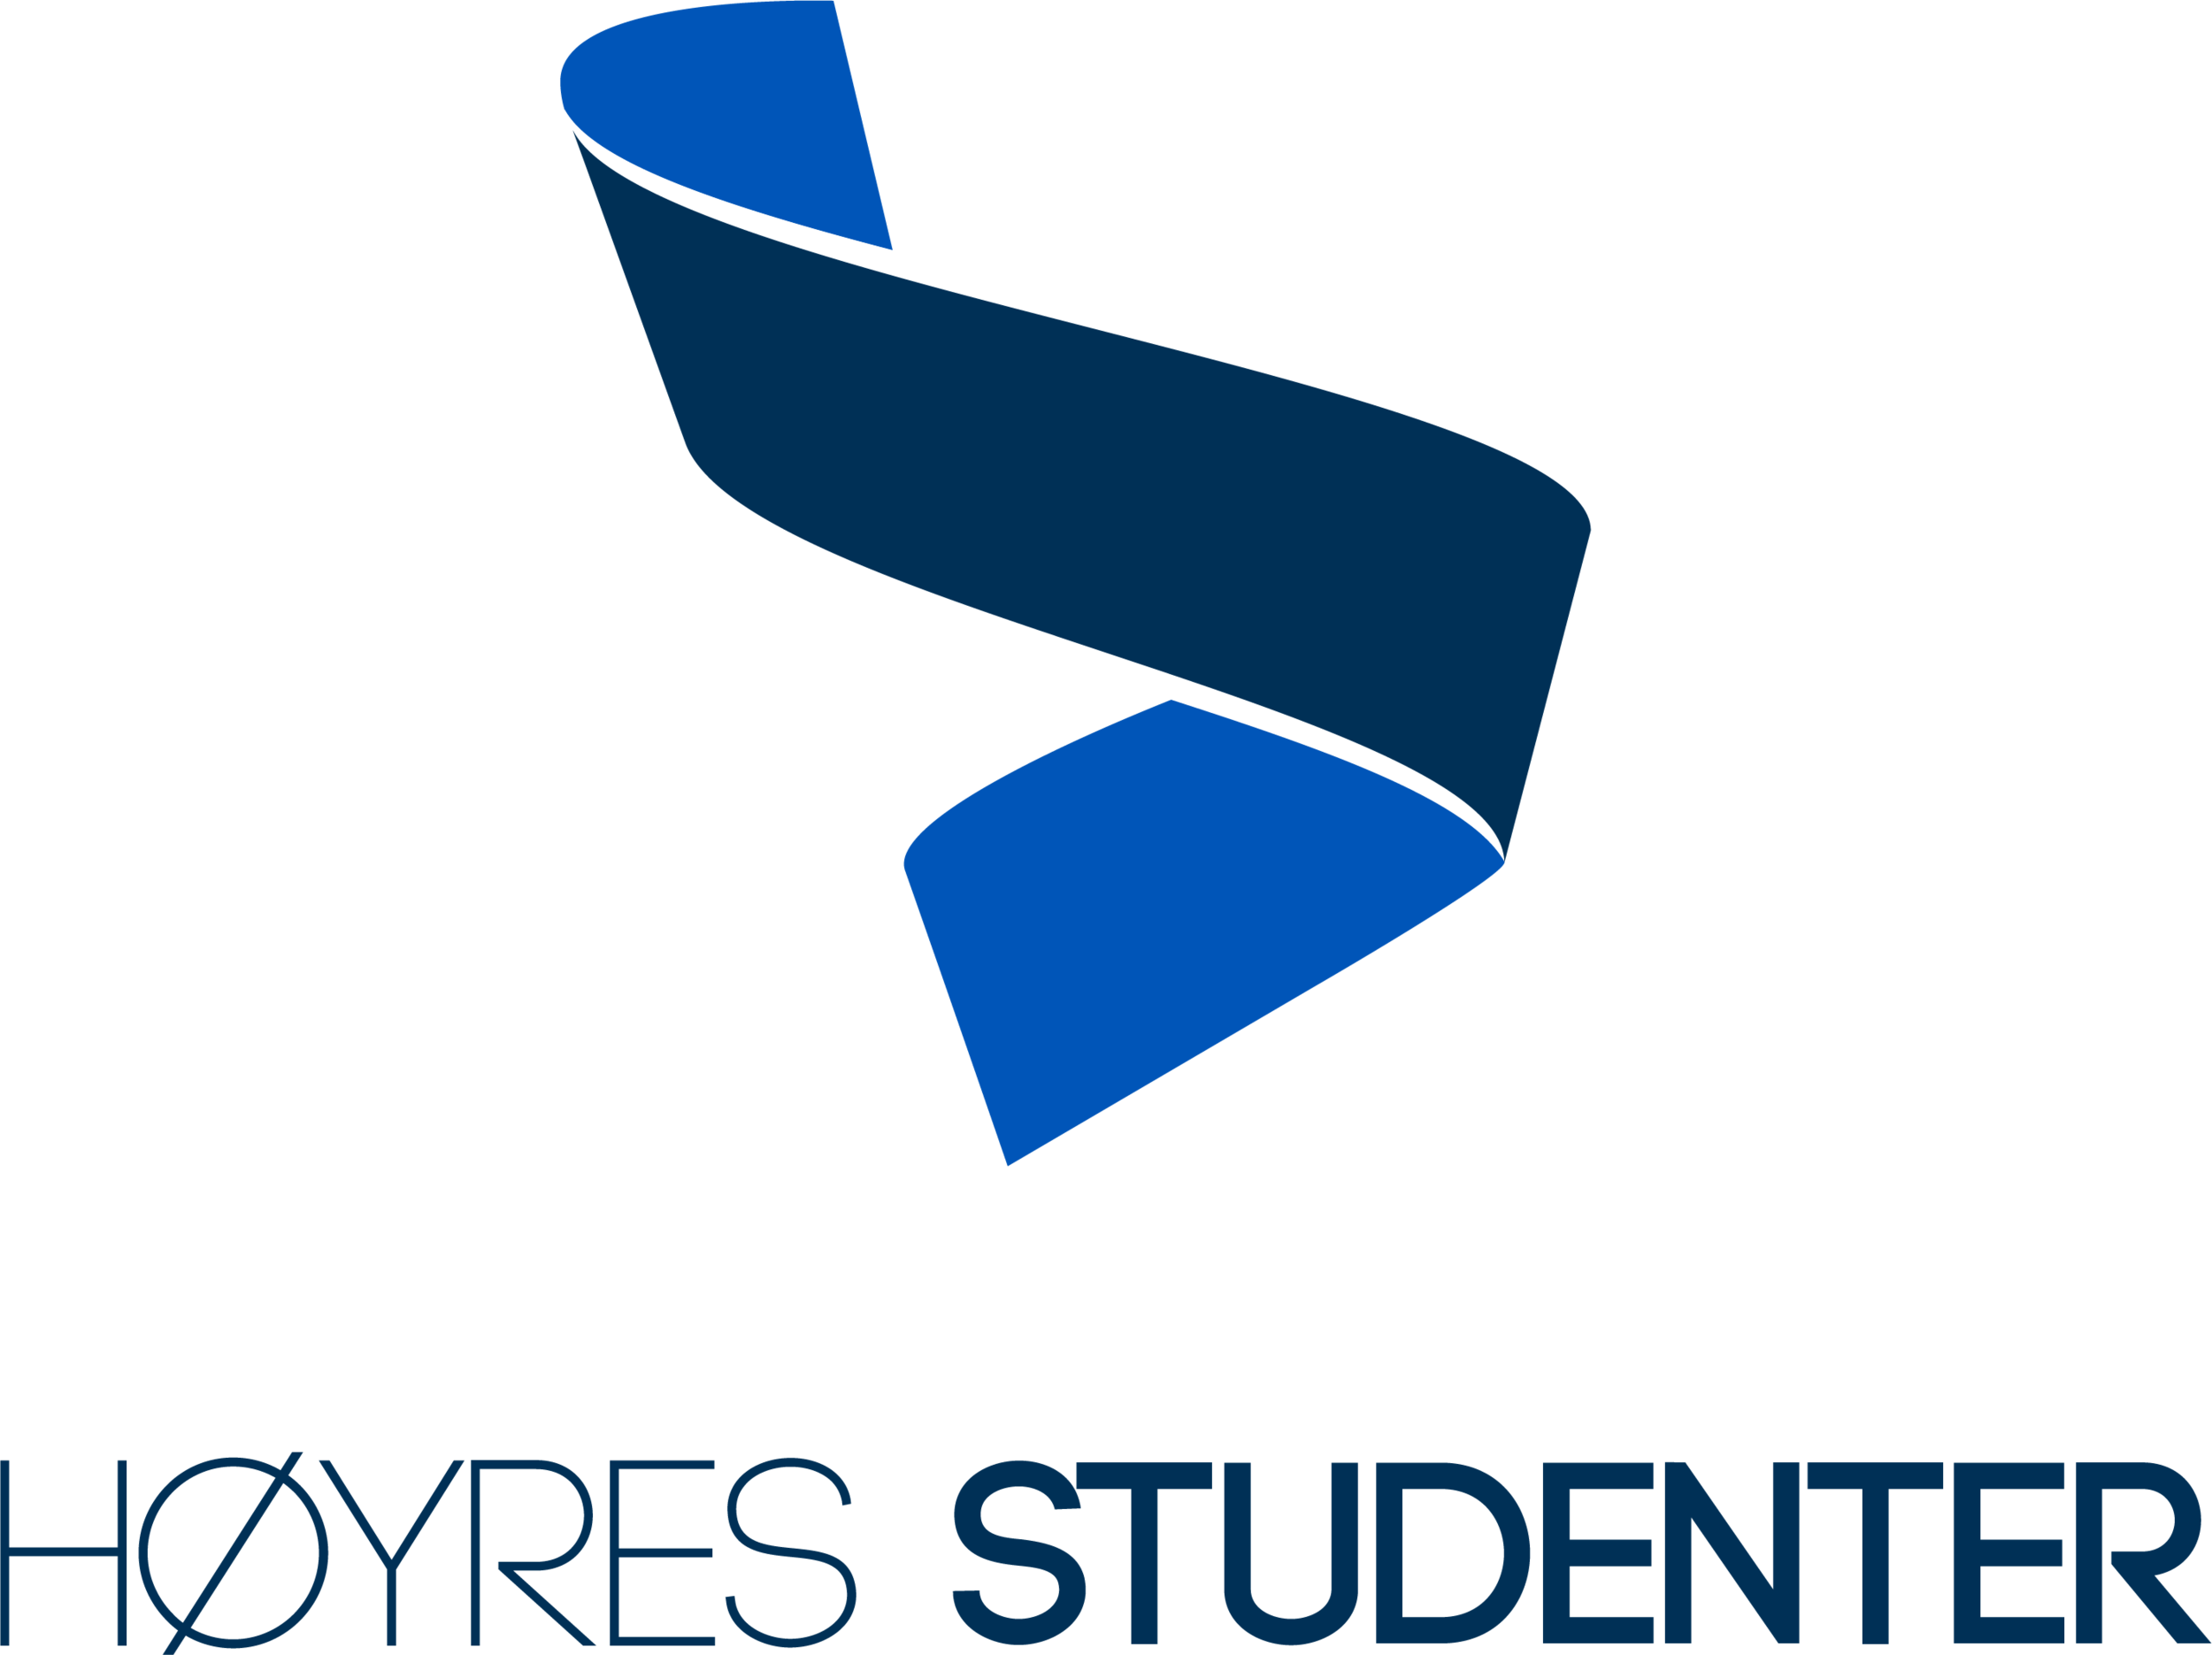 Høyres Studenter_Primary_logo_RGB.png